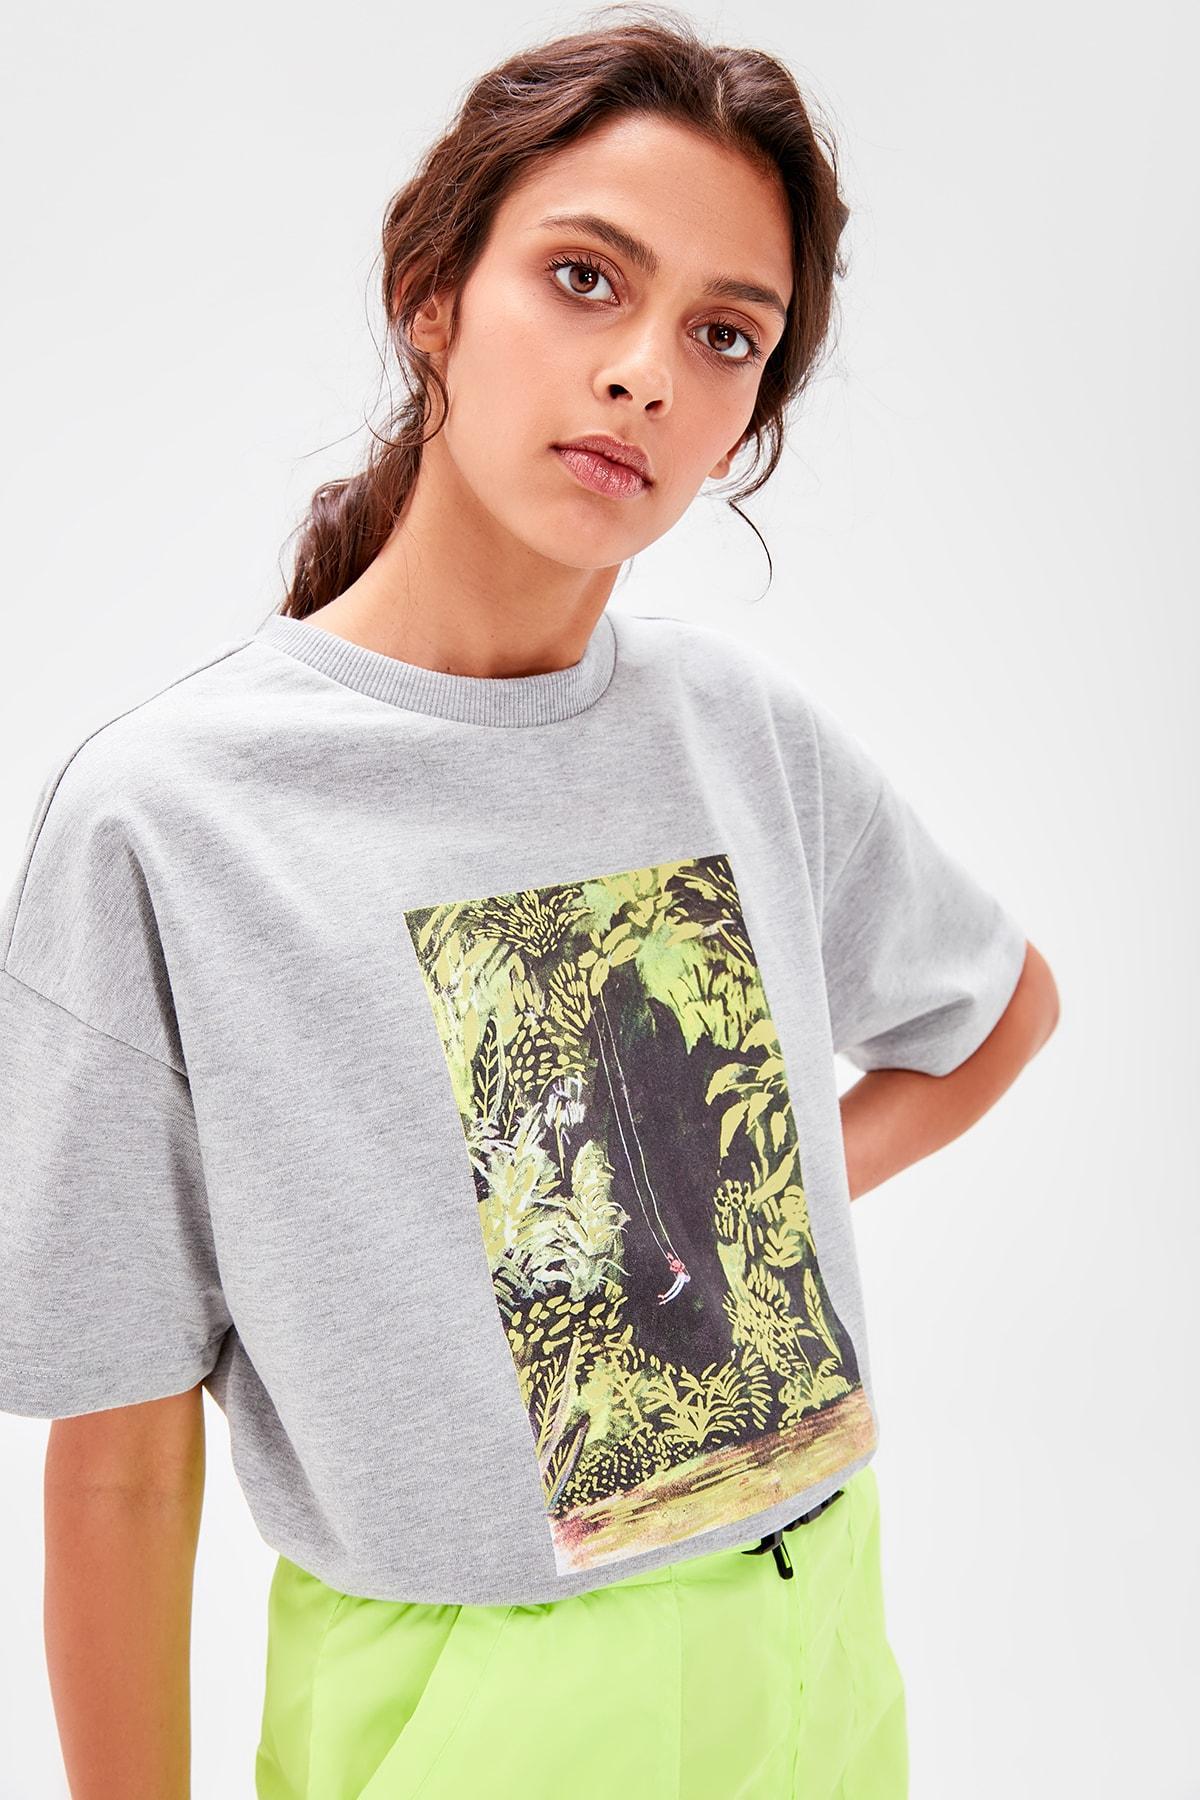 Trendyol Gray Printed Short-Sleeve Knitted Sweatshirt TWOAW20SW0026